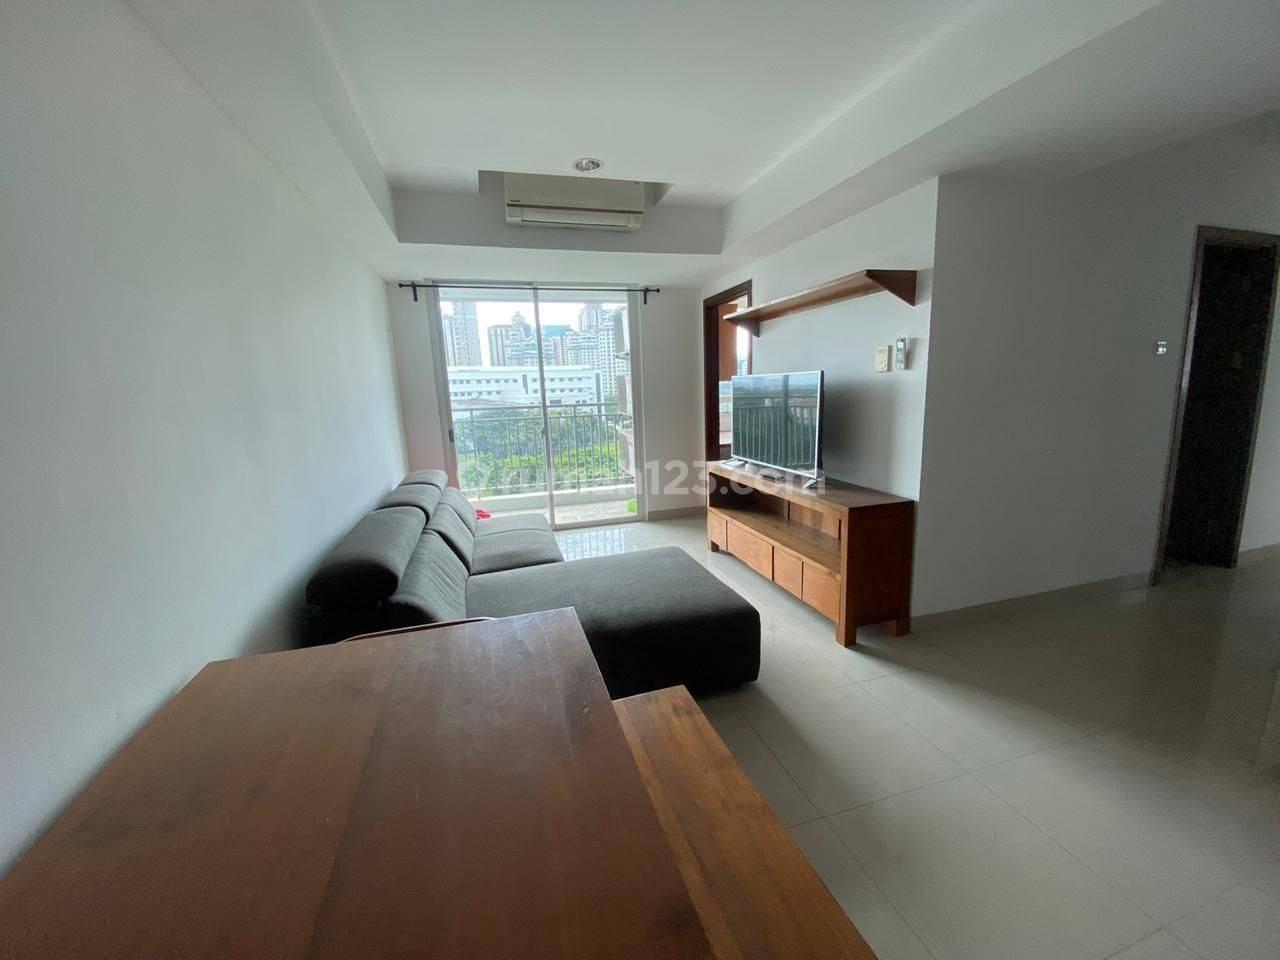 Apartemen Springhill Terrace Tower Sandalwood Type 3+1 Fully Furnish Lantai Rendah